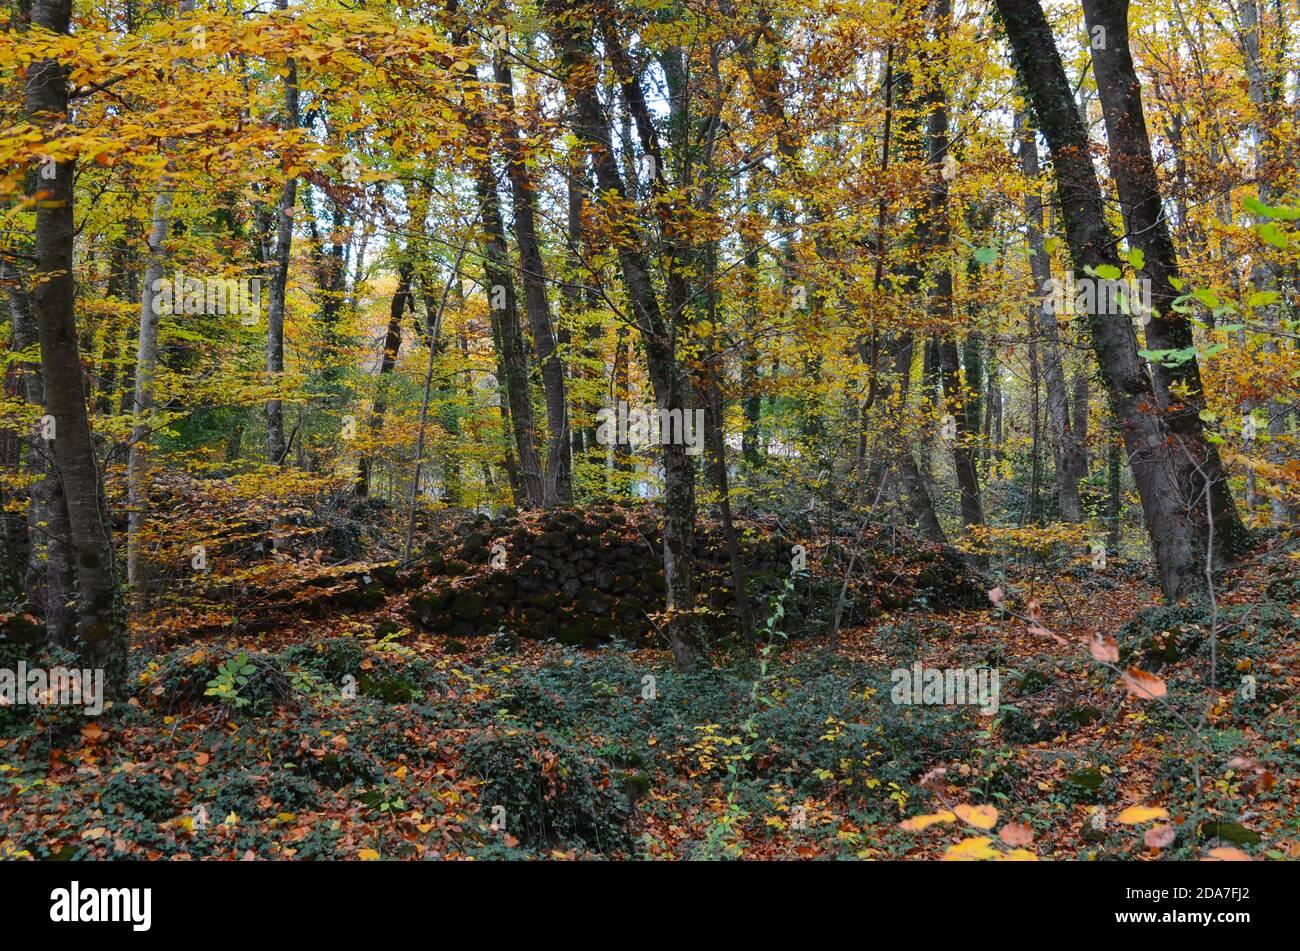 Autumn colours in the Fageda d'En Jordà beech forest, Garrotxa Volcanic Zone Natural Park, Catalonia Stock Photo